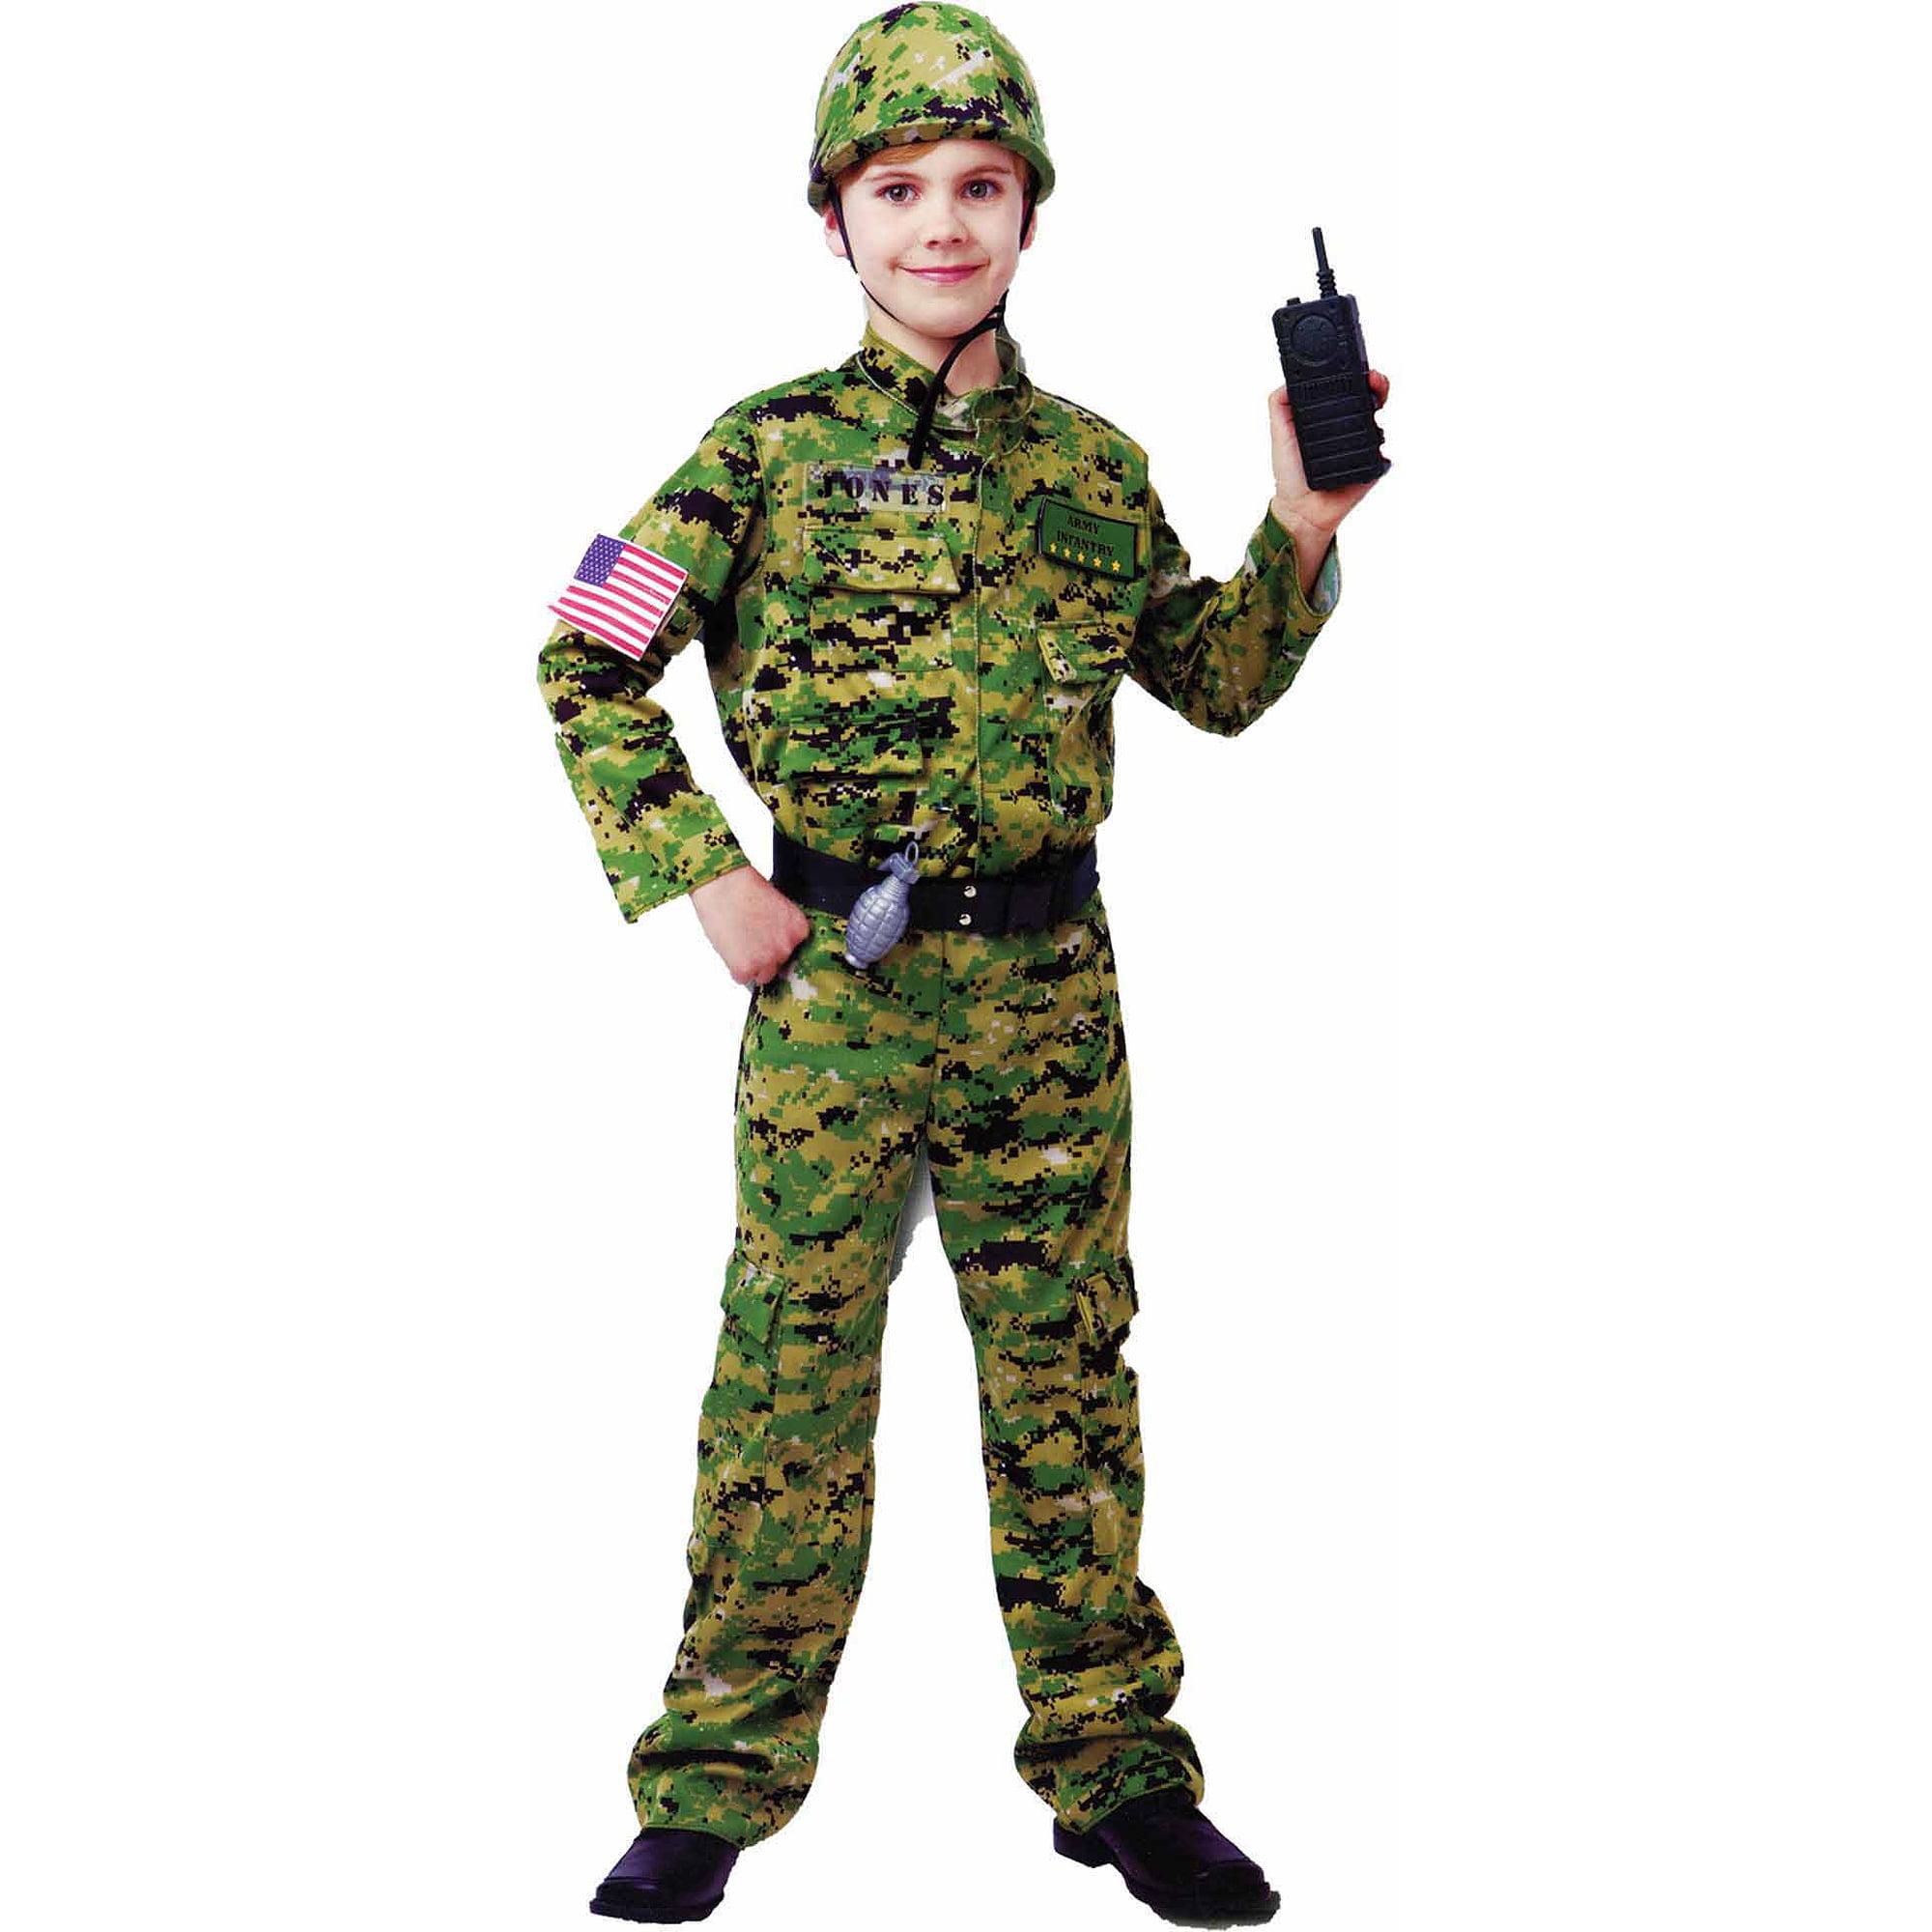 Generic Army Infantry Child Halloween Costume